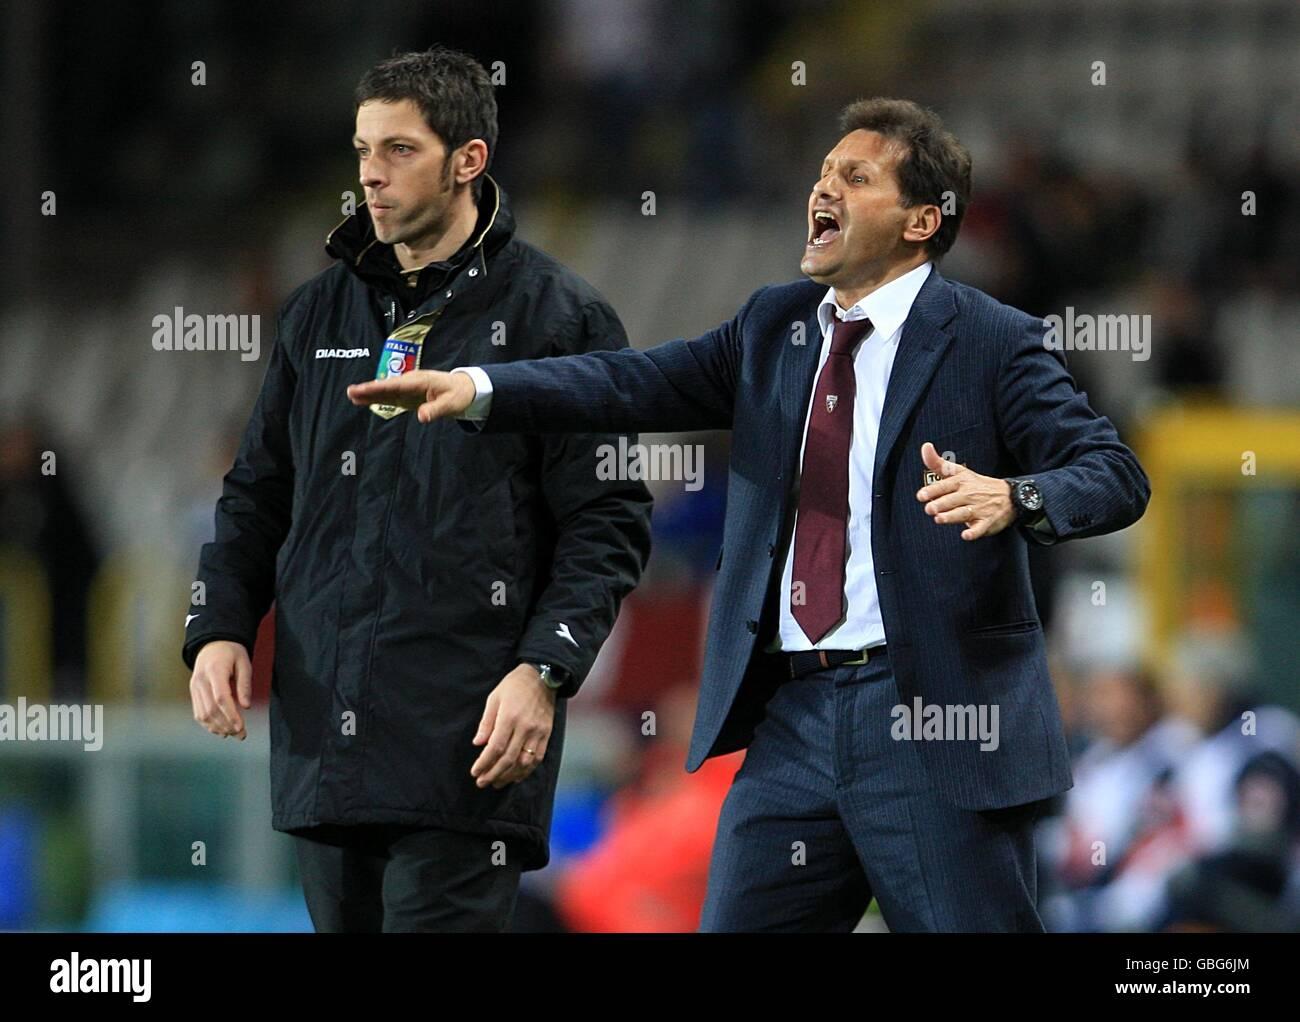 Soccer - Italian Serie A - Torino v Juventus - Olimpico di Torino Stock Photo